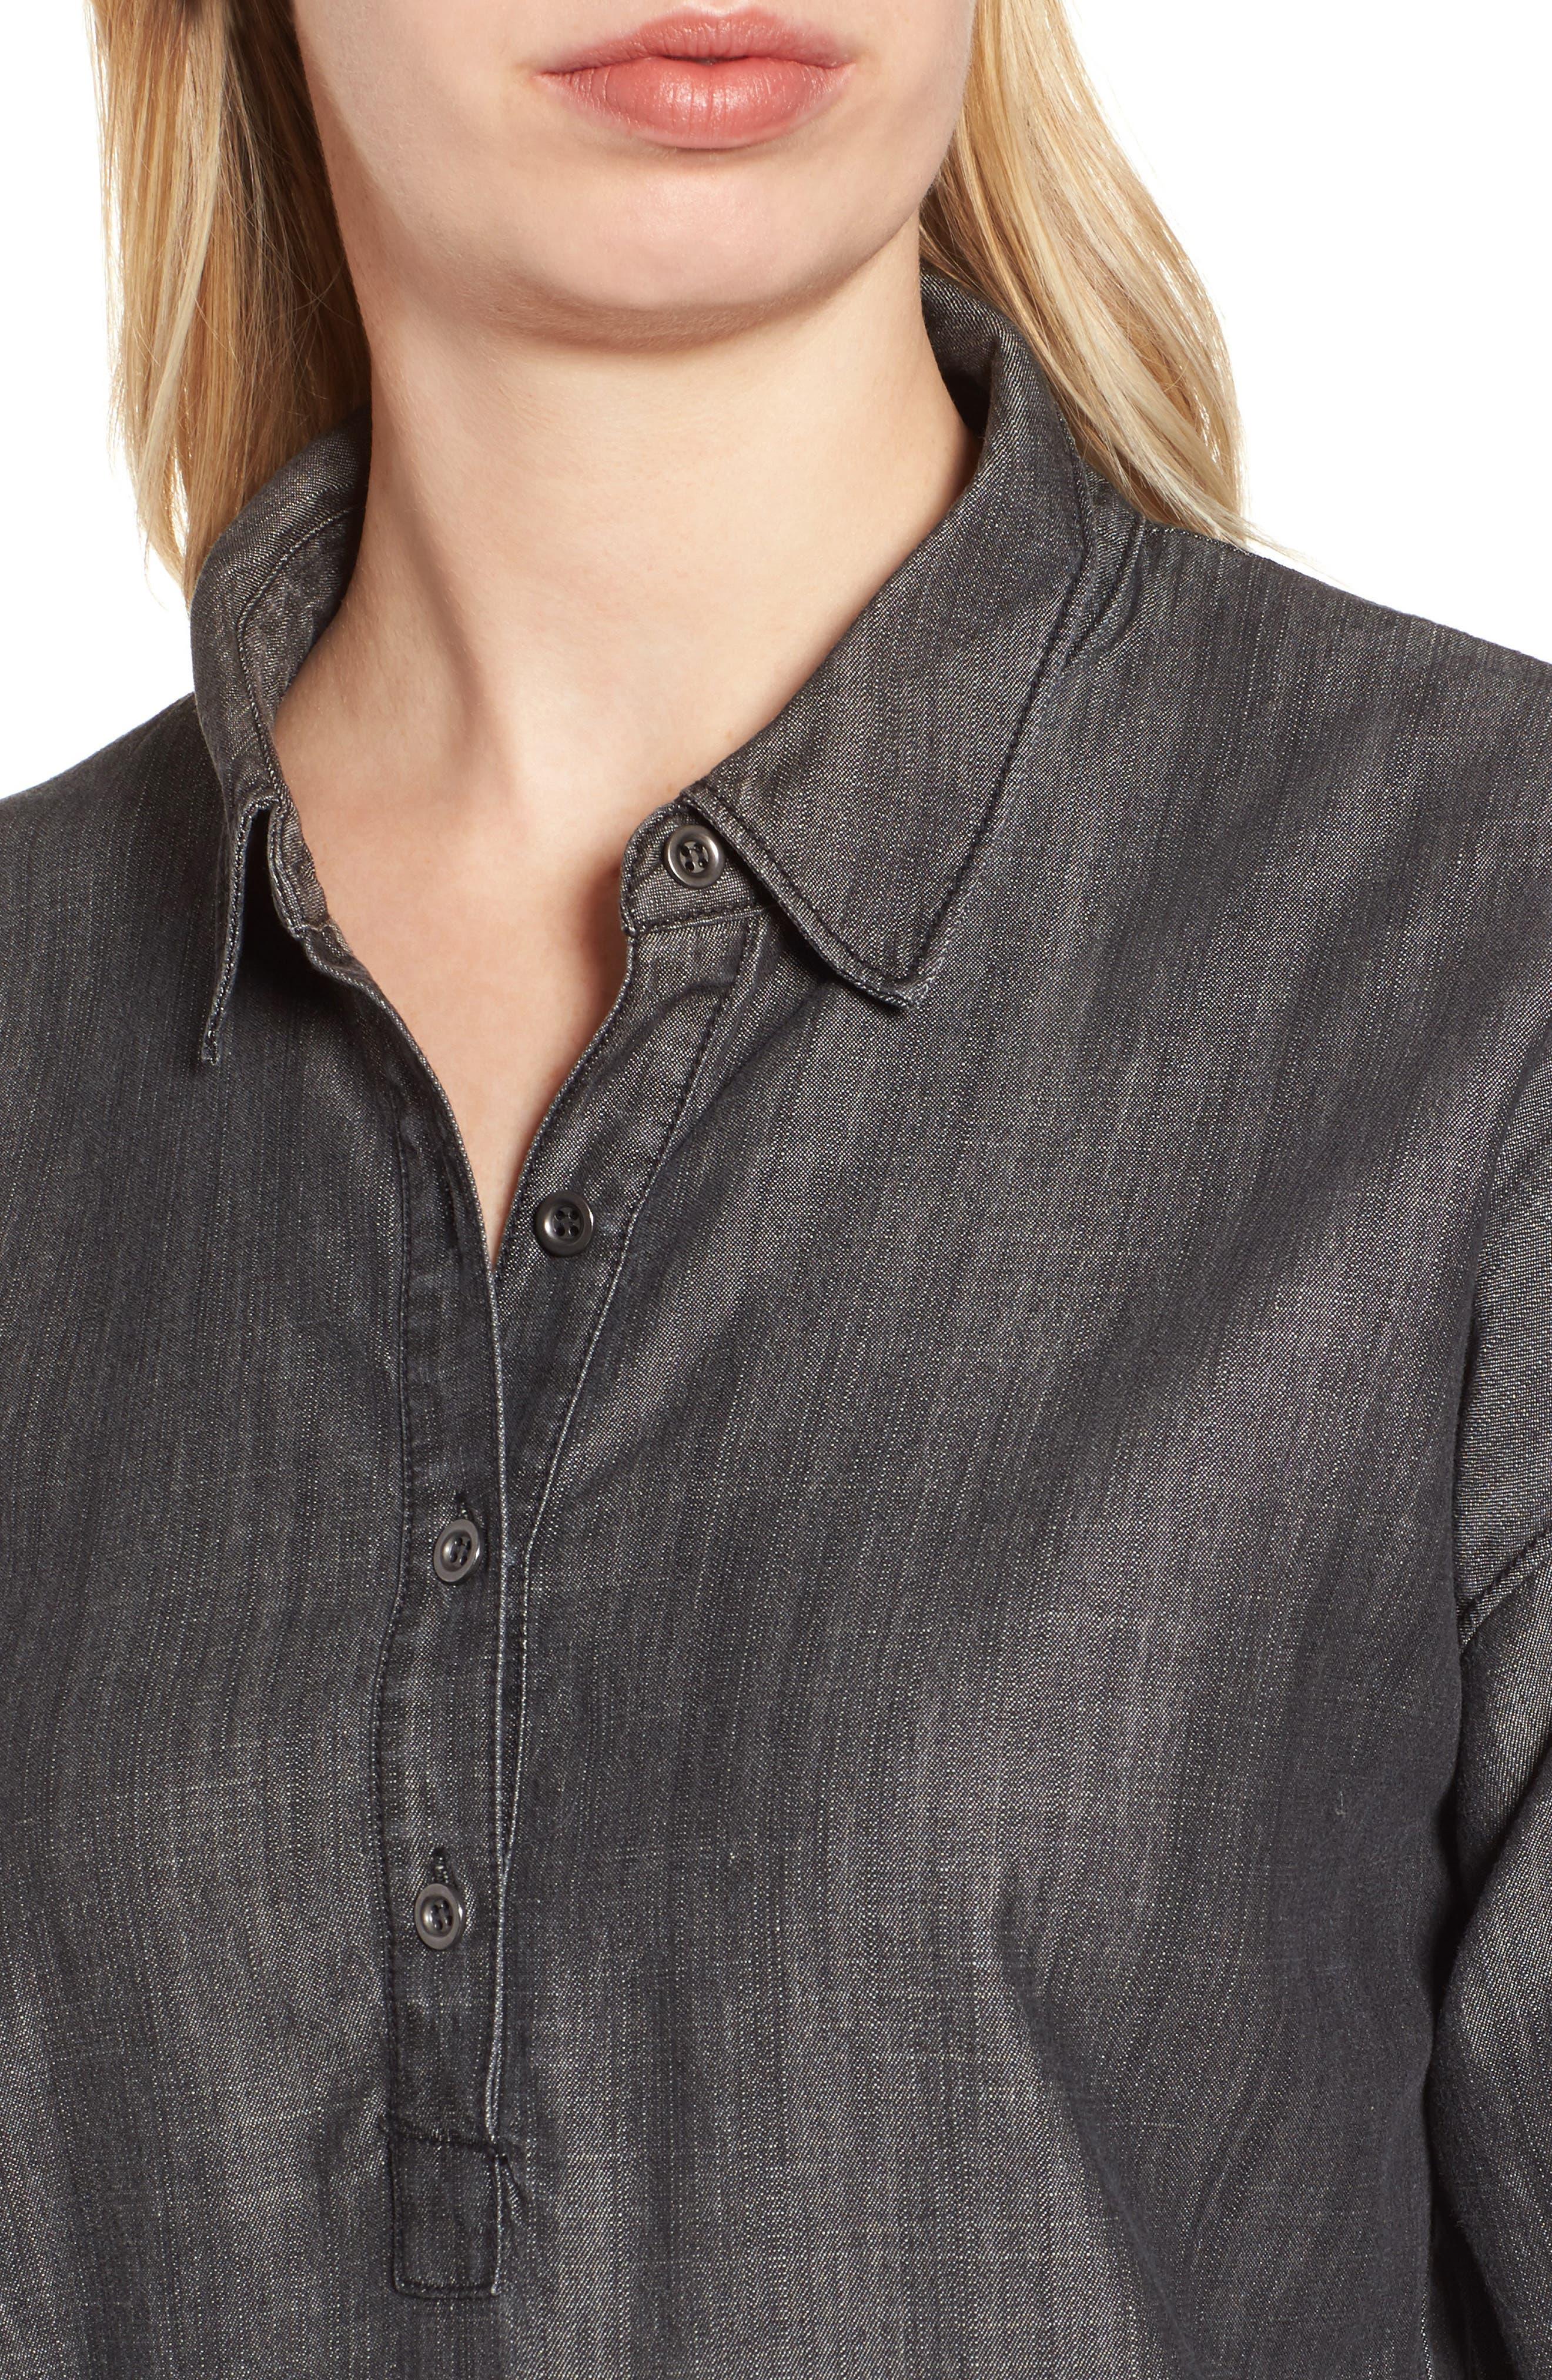 Tencel<sup>®</sup> Lyocell & Organic Cotton Tunic Shirt,                             Alternate thumbnail 4, color,                             Black